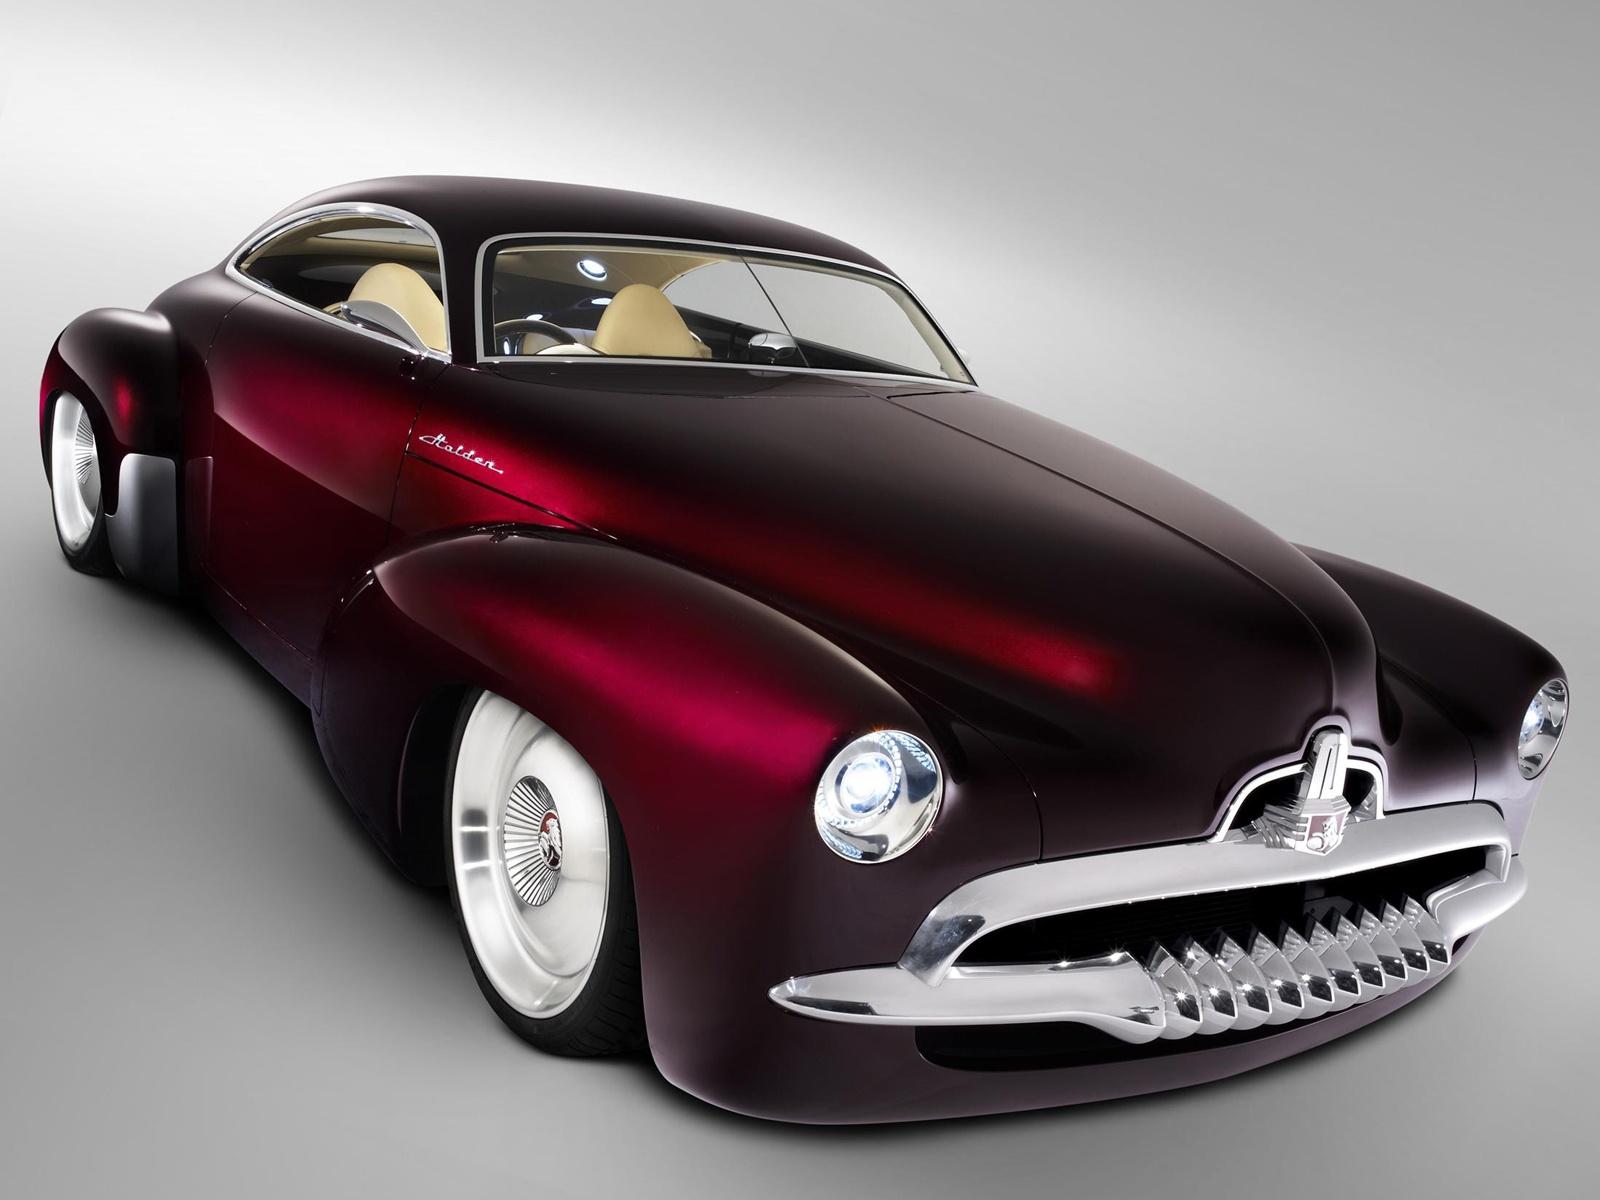 http://2.bp.blogspot.com/-hM57fwfPaqk/TiHfyB6CdhI/AAAAAAAAB54/saxxb1i6iVg/s1600/Holden_Classic_Car_freecomputerdesktopwallpaper_1600.jpg